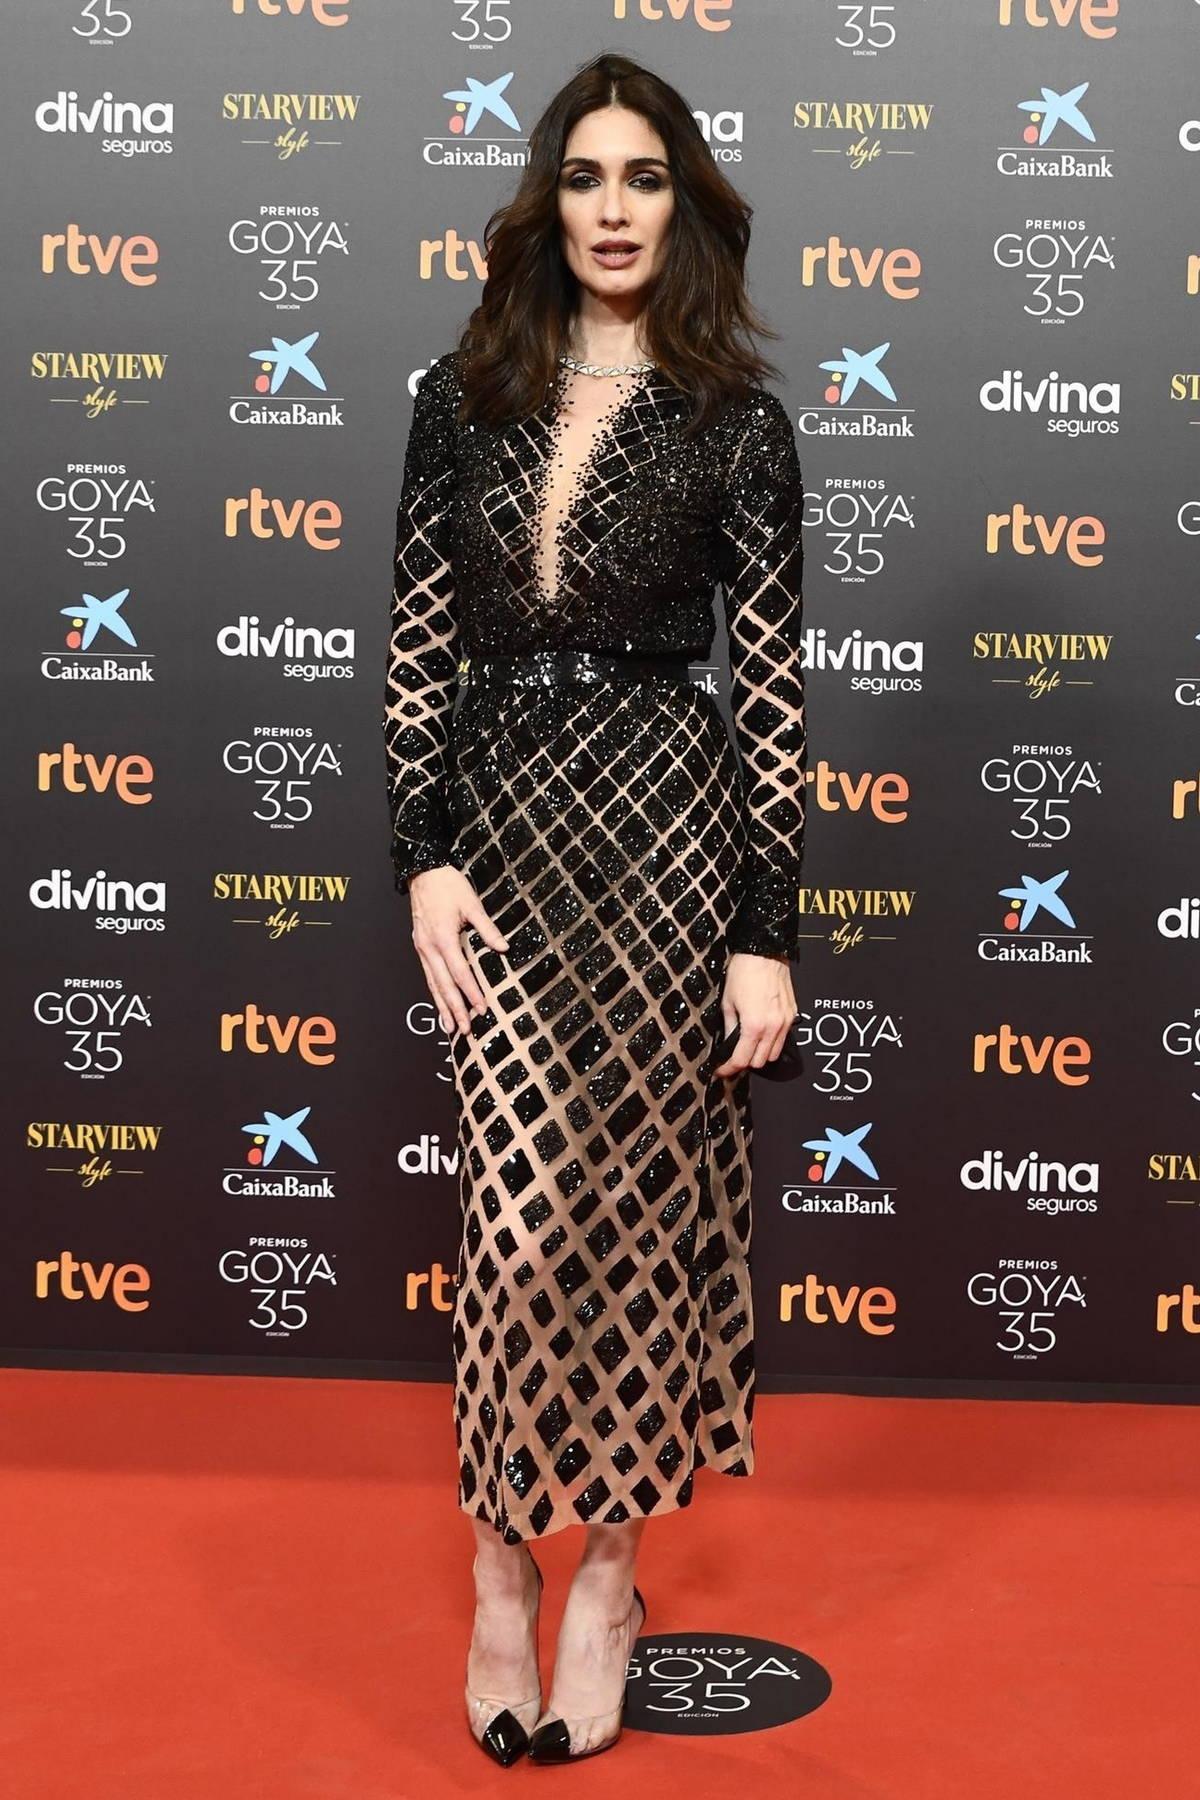 Paz Vega attends the Goya Cinema Awards 2021 at Gran Hotel Miramar in Malaga, Spain